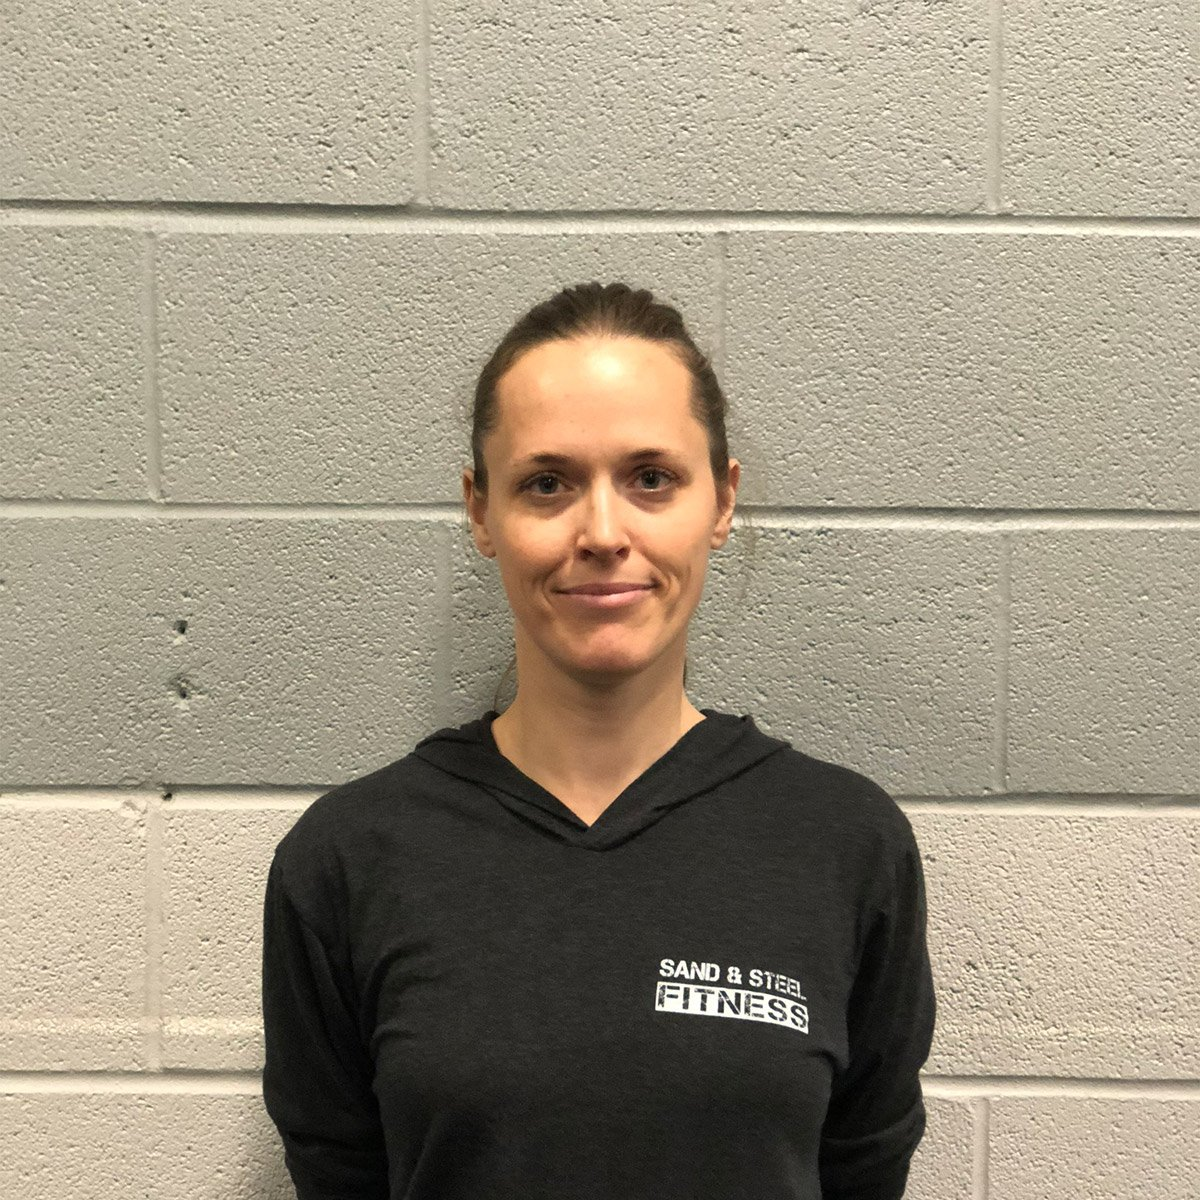 Monika Yoga Teacher eryt-500